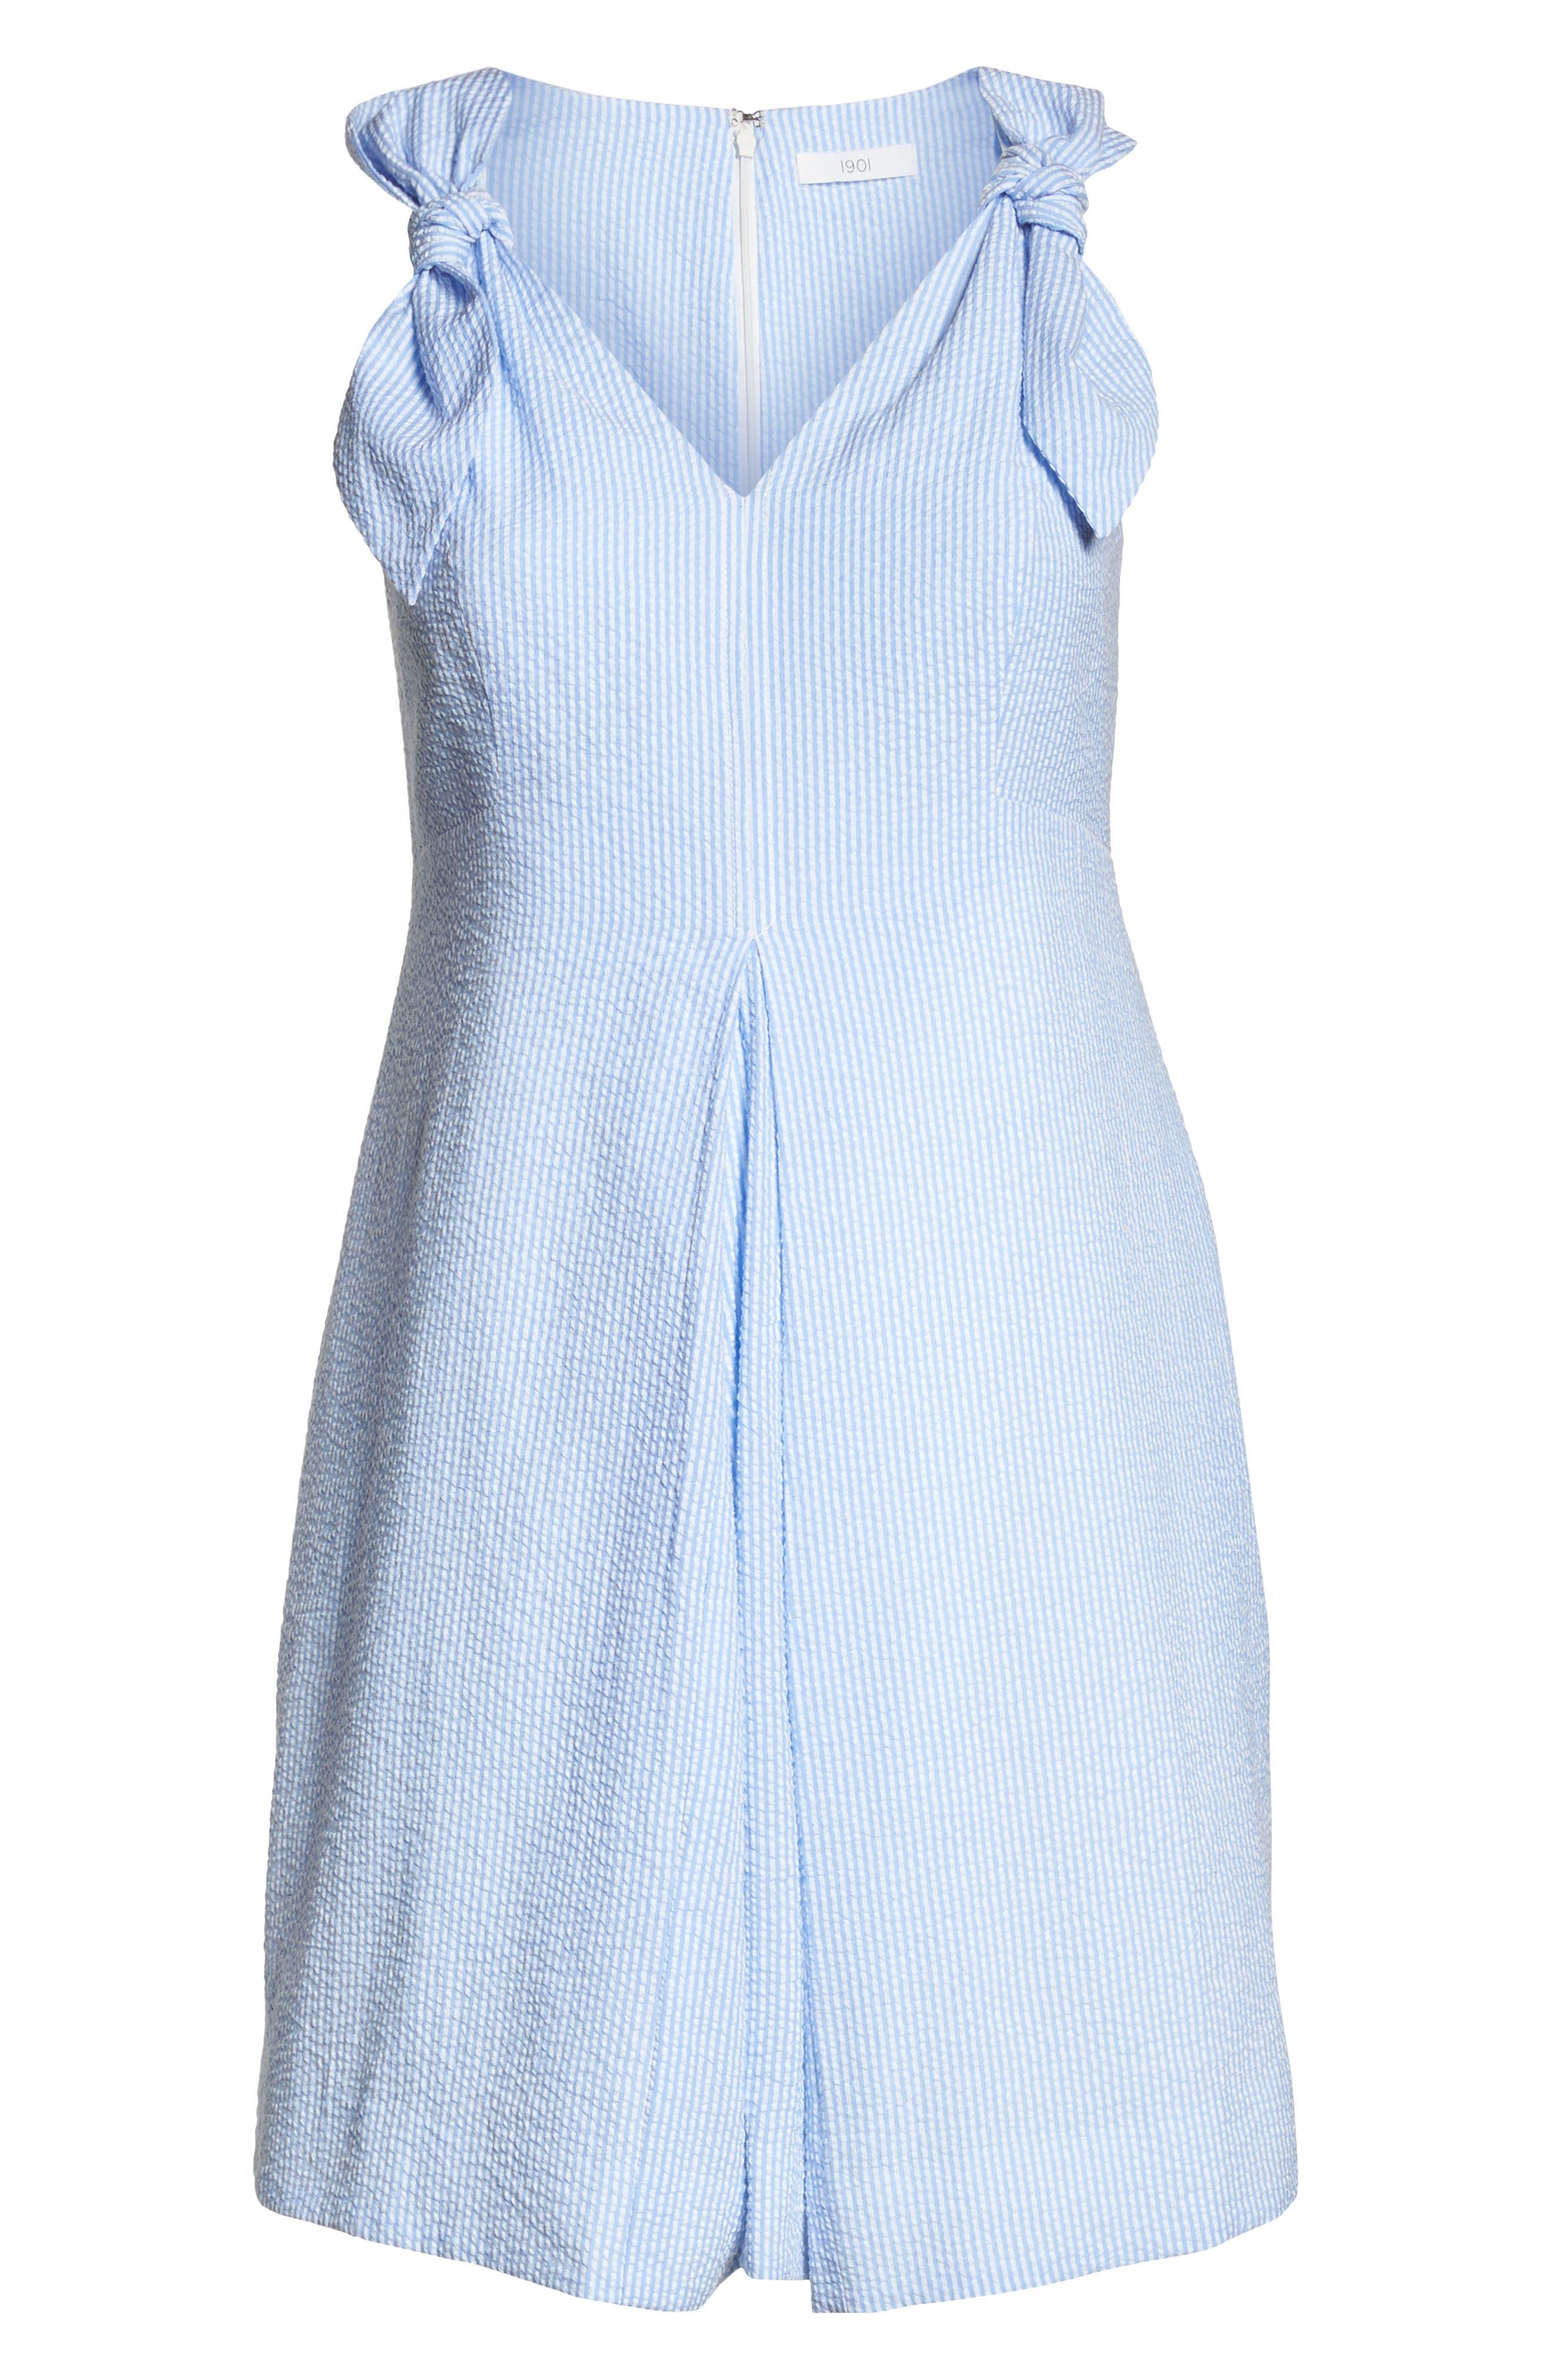 Bow Shoulder Seersucker Dress,                             Alternate thumbnail 7, color,                             420